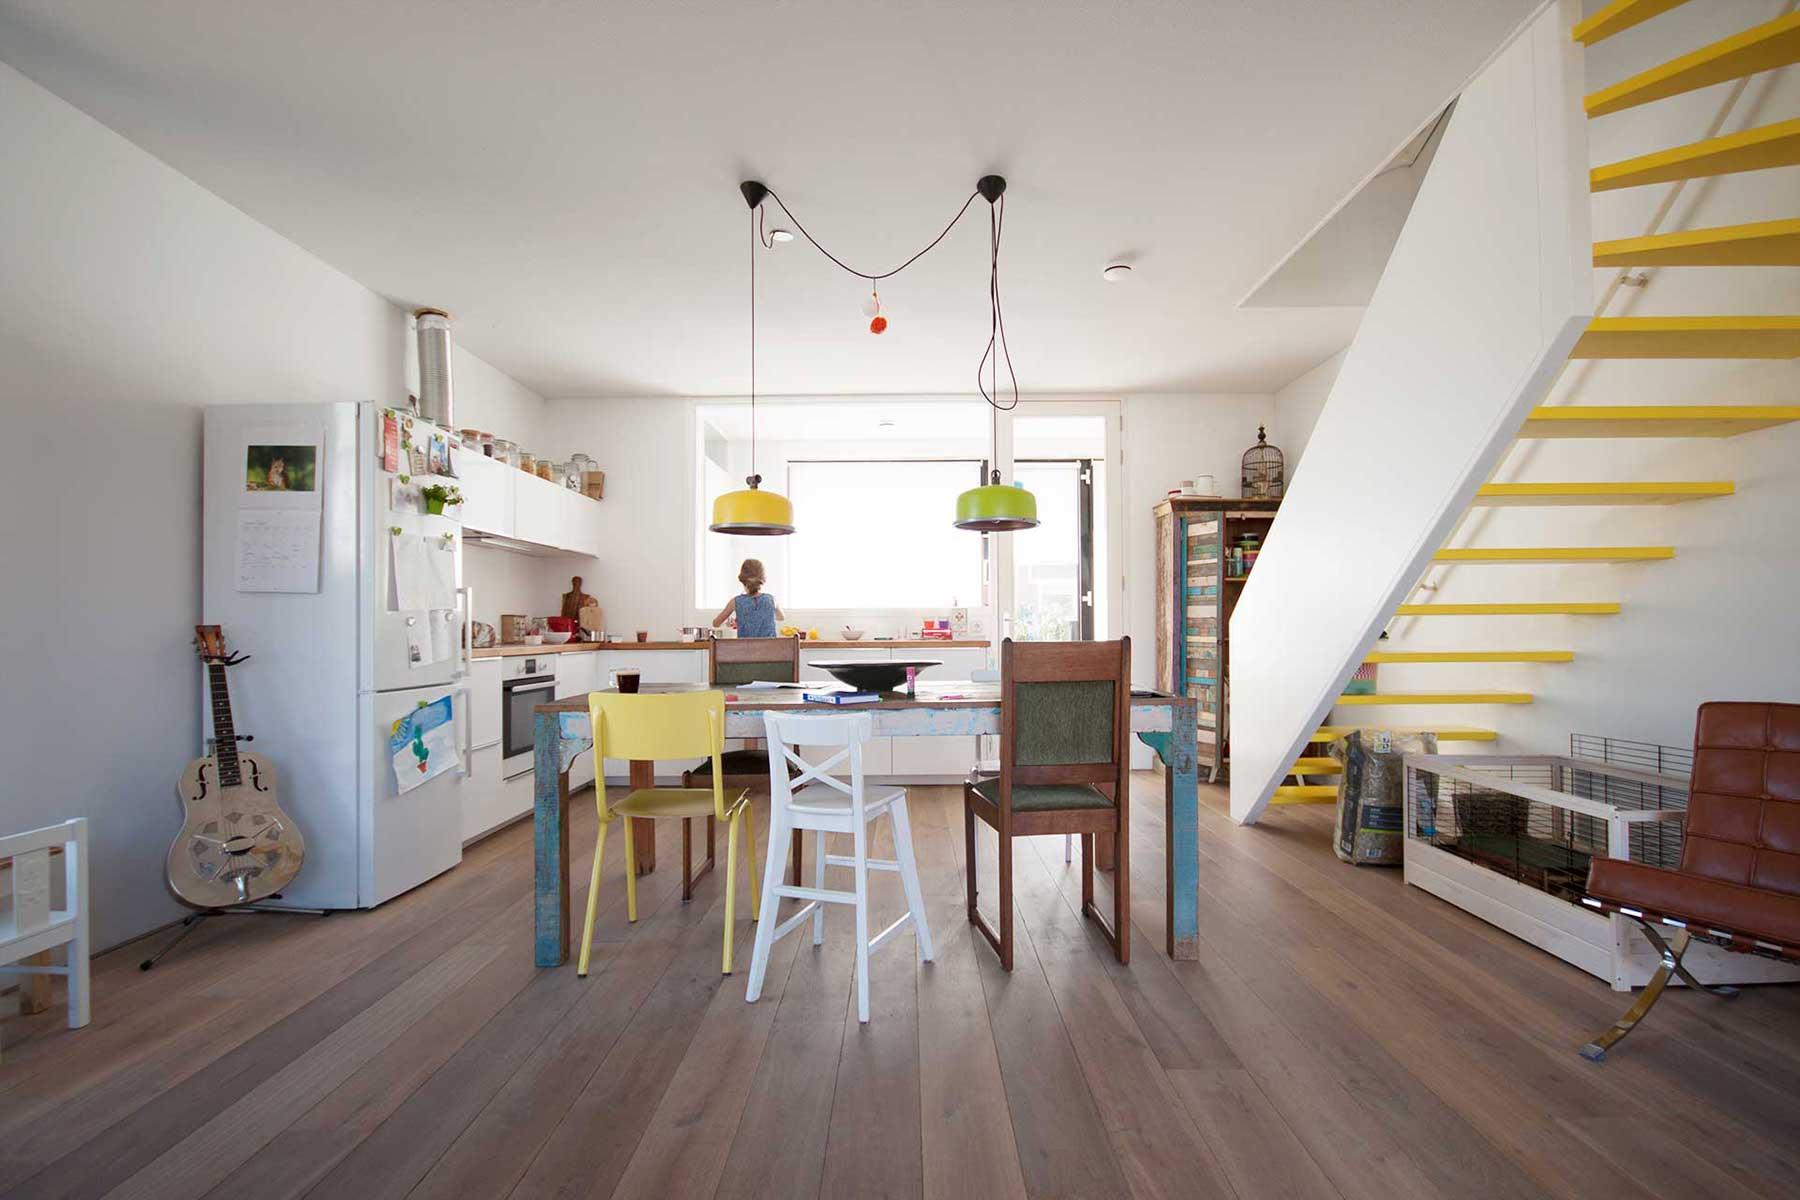 8A-Architecten-CPO-Loggia-house-Lent-06